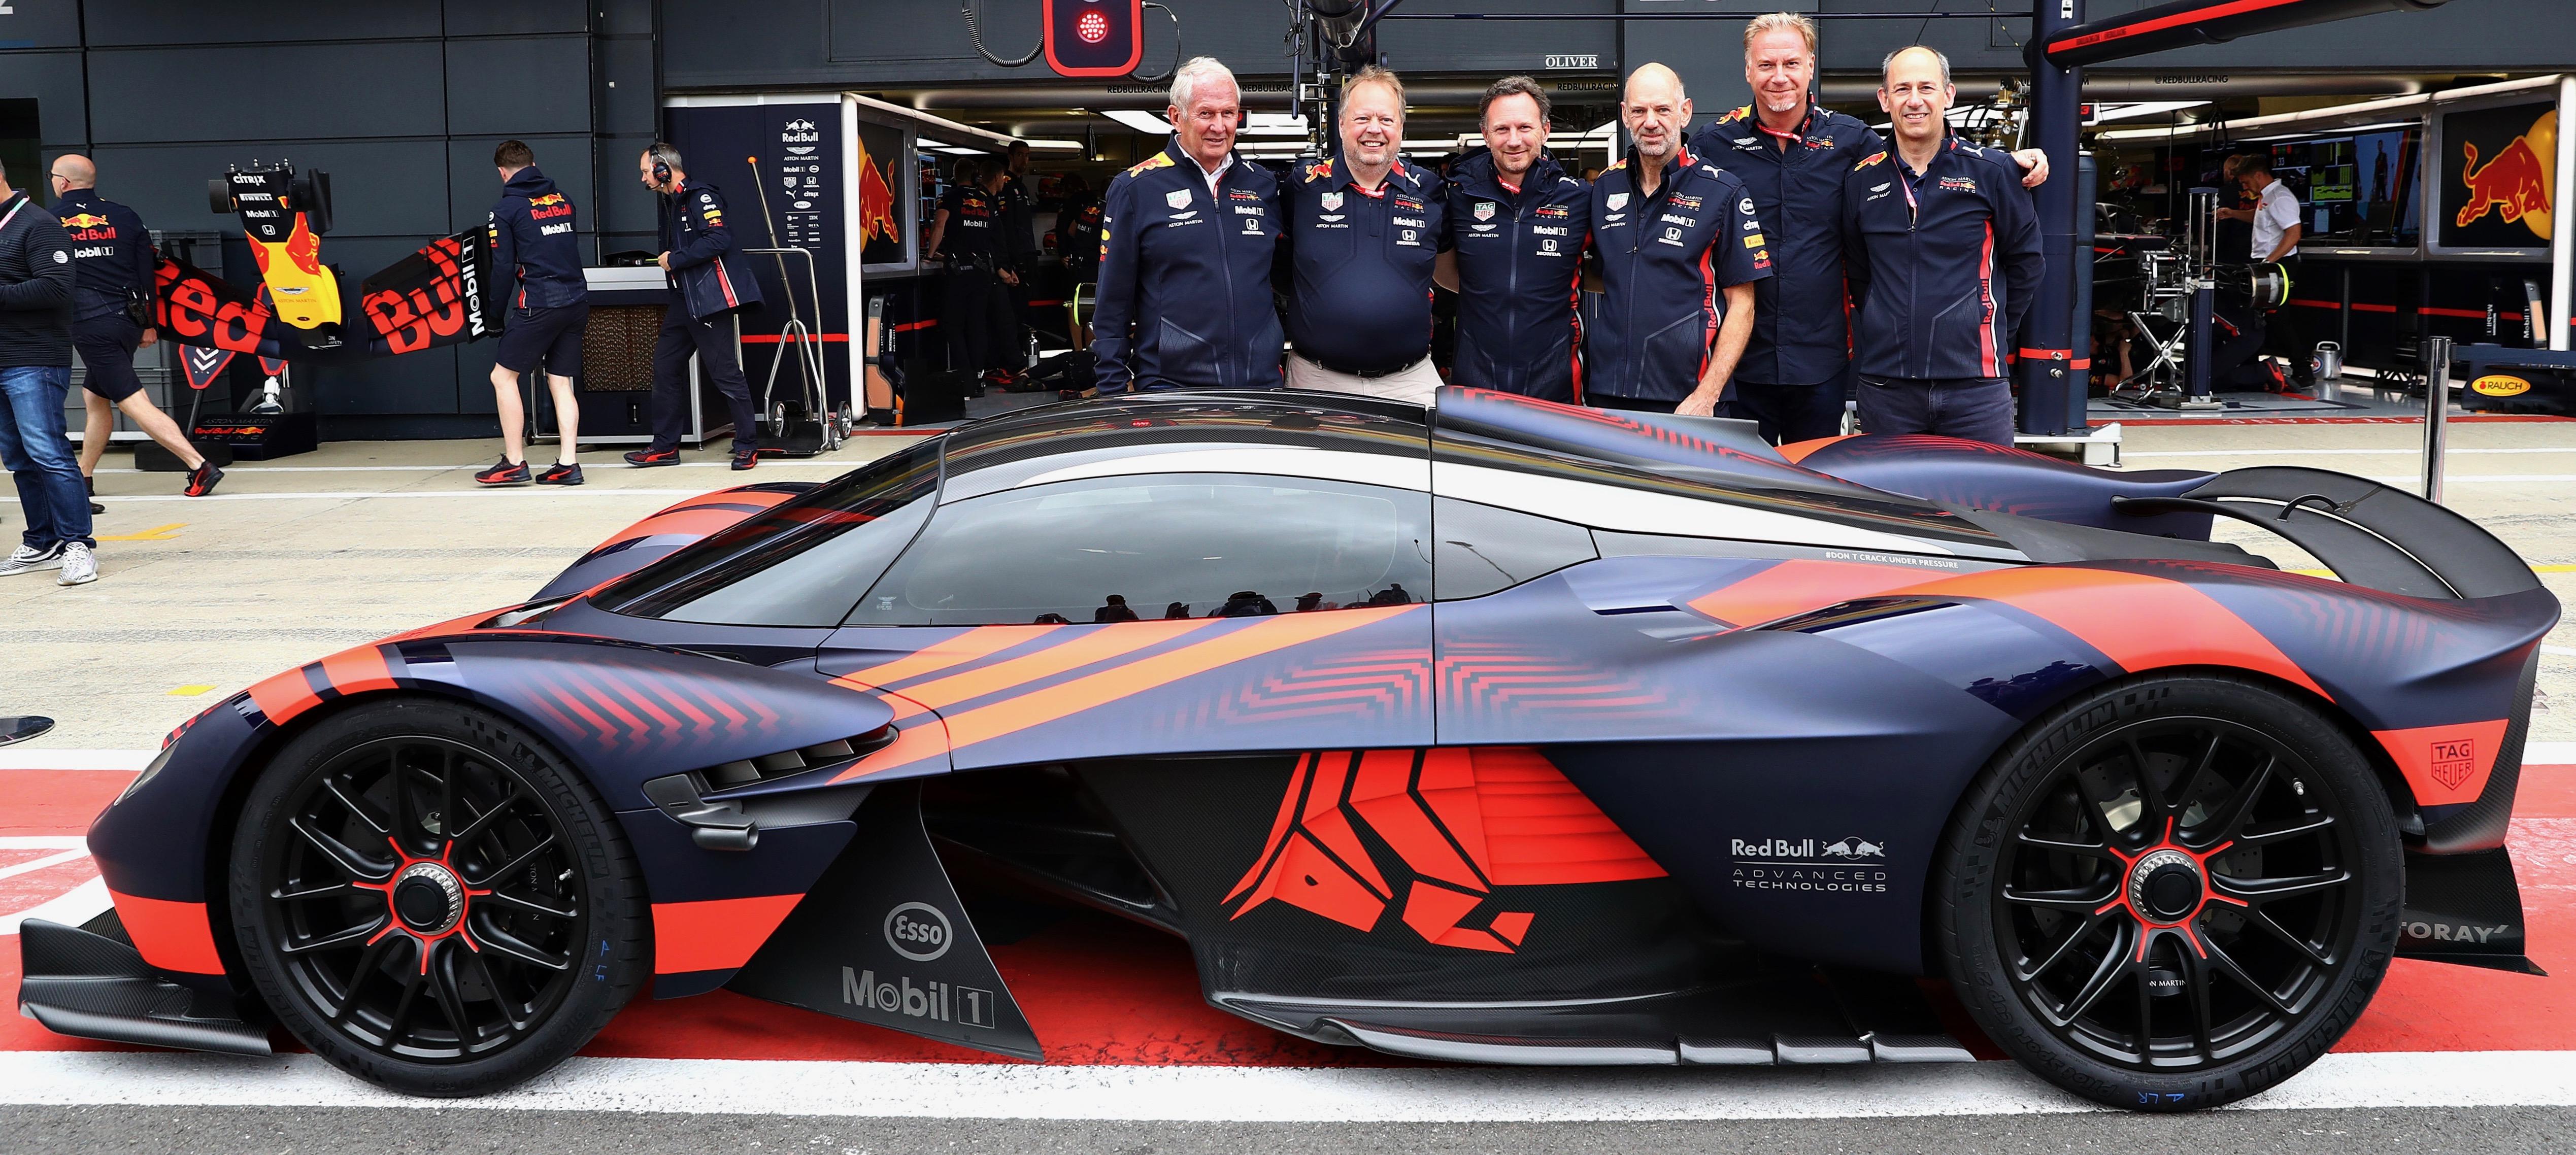 Aston Martin Valkyrie Jonathan Shuttleworth Cars